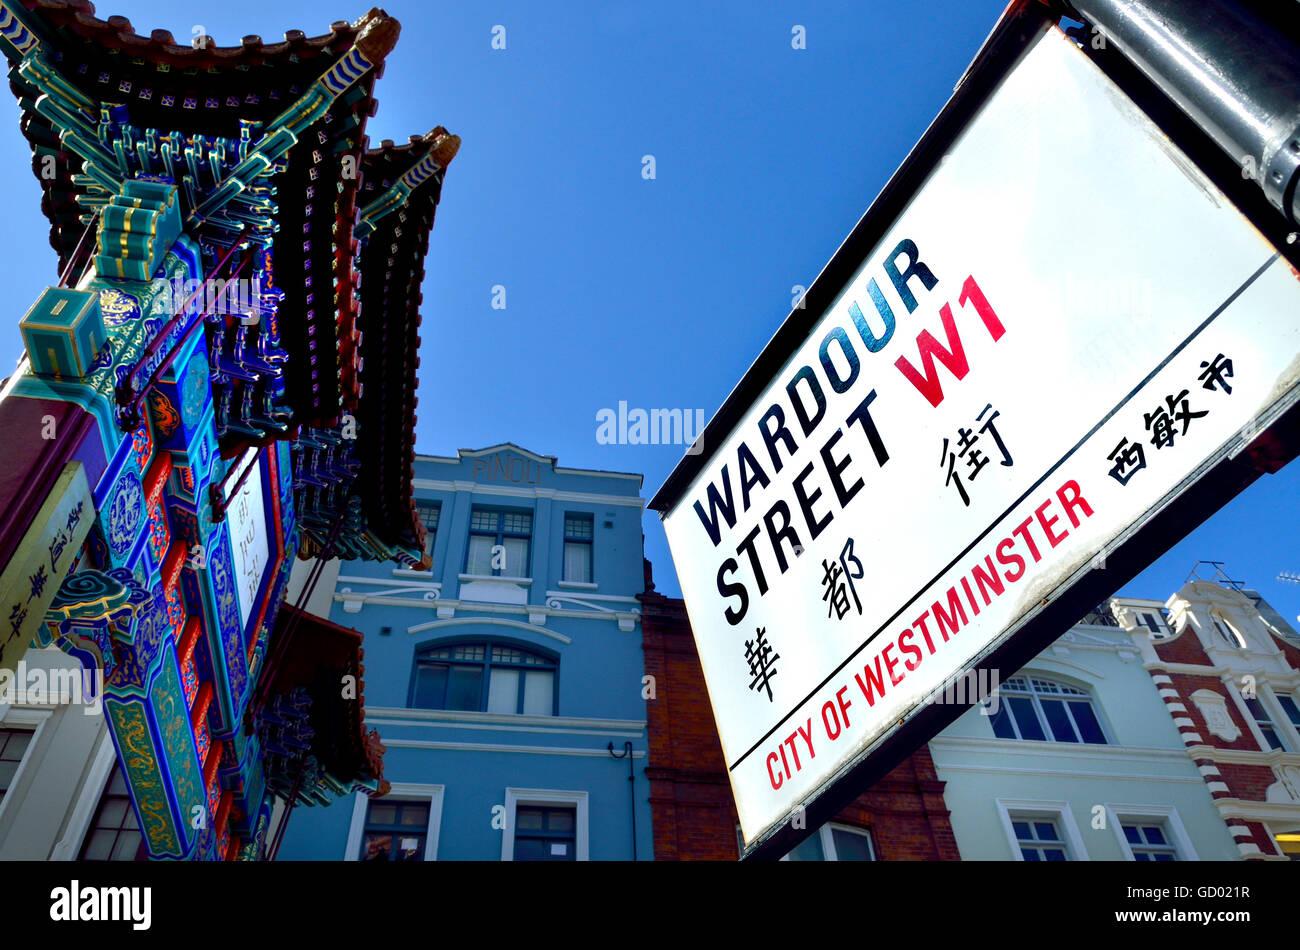 London, England, UK. Wardour Street sign, Chinatown. New gate (2106 - Qing Dynasty replica) - Stock Image